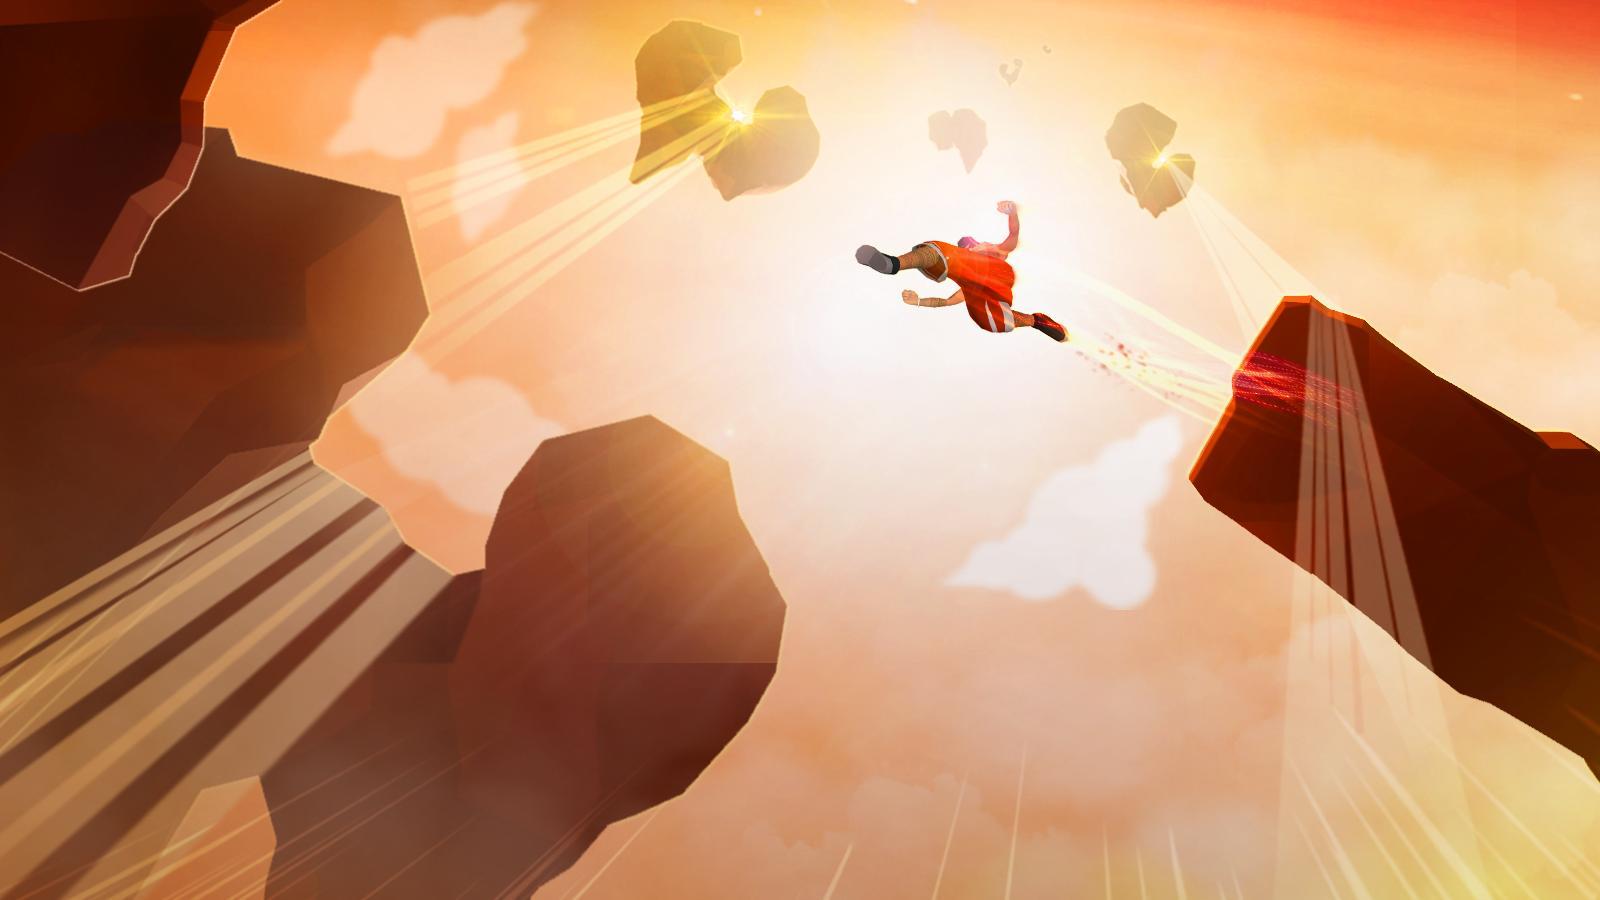 Sky Dancer Run - Running Game 4.2.0 Screenshot 3